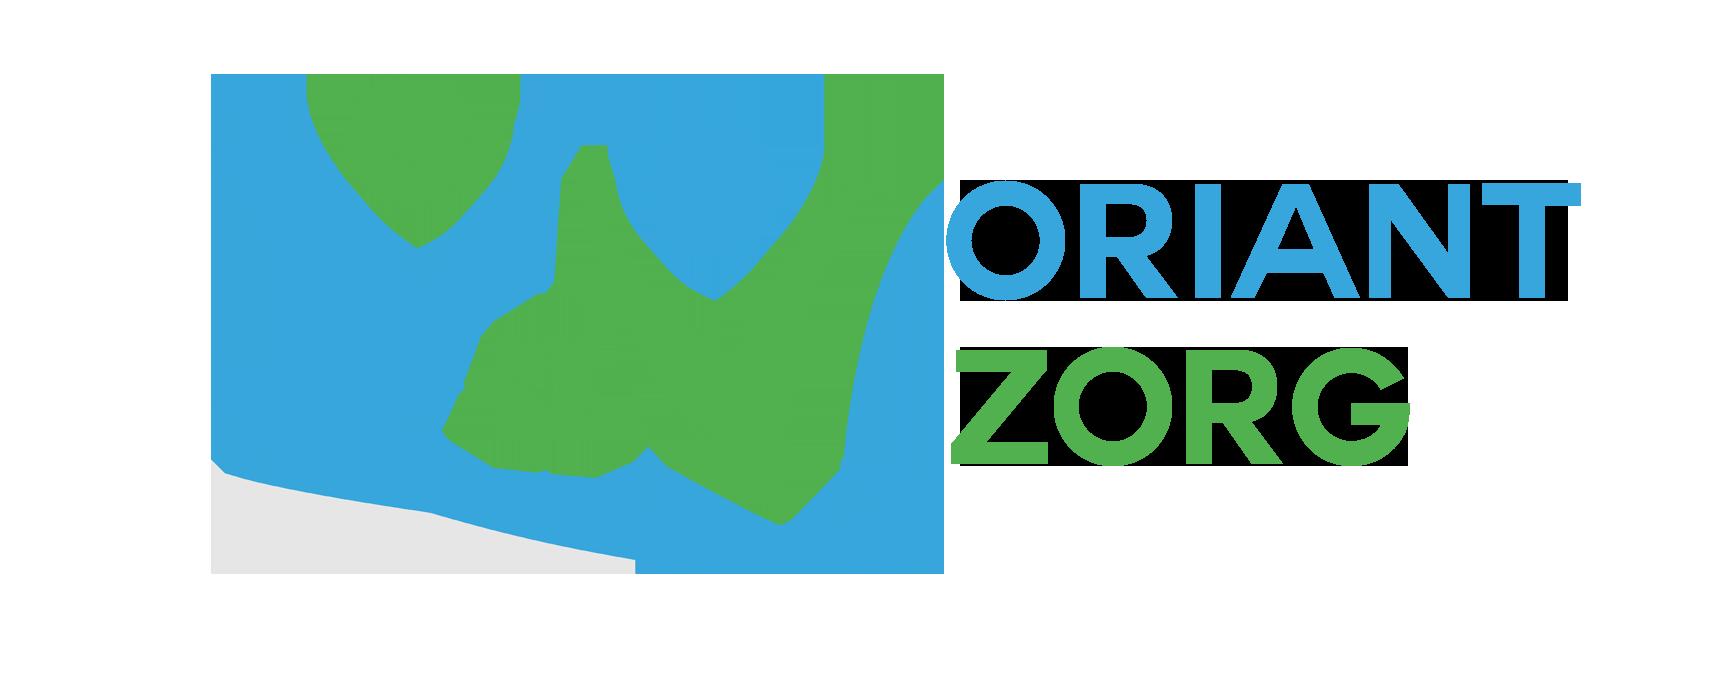 Oriant Zorg